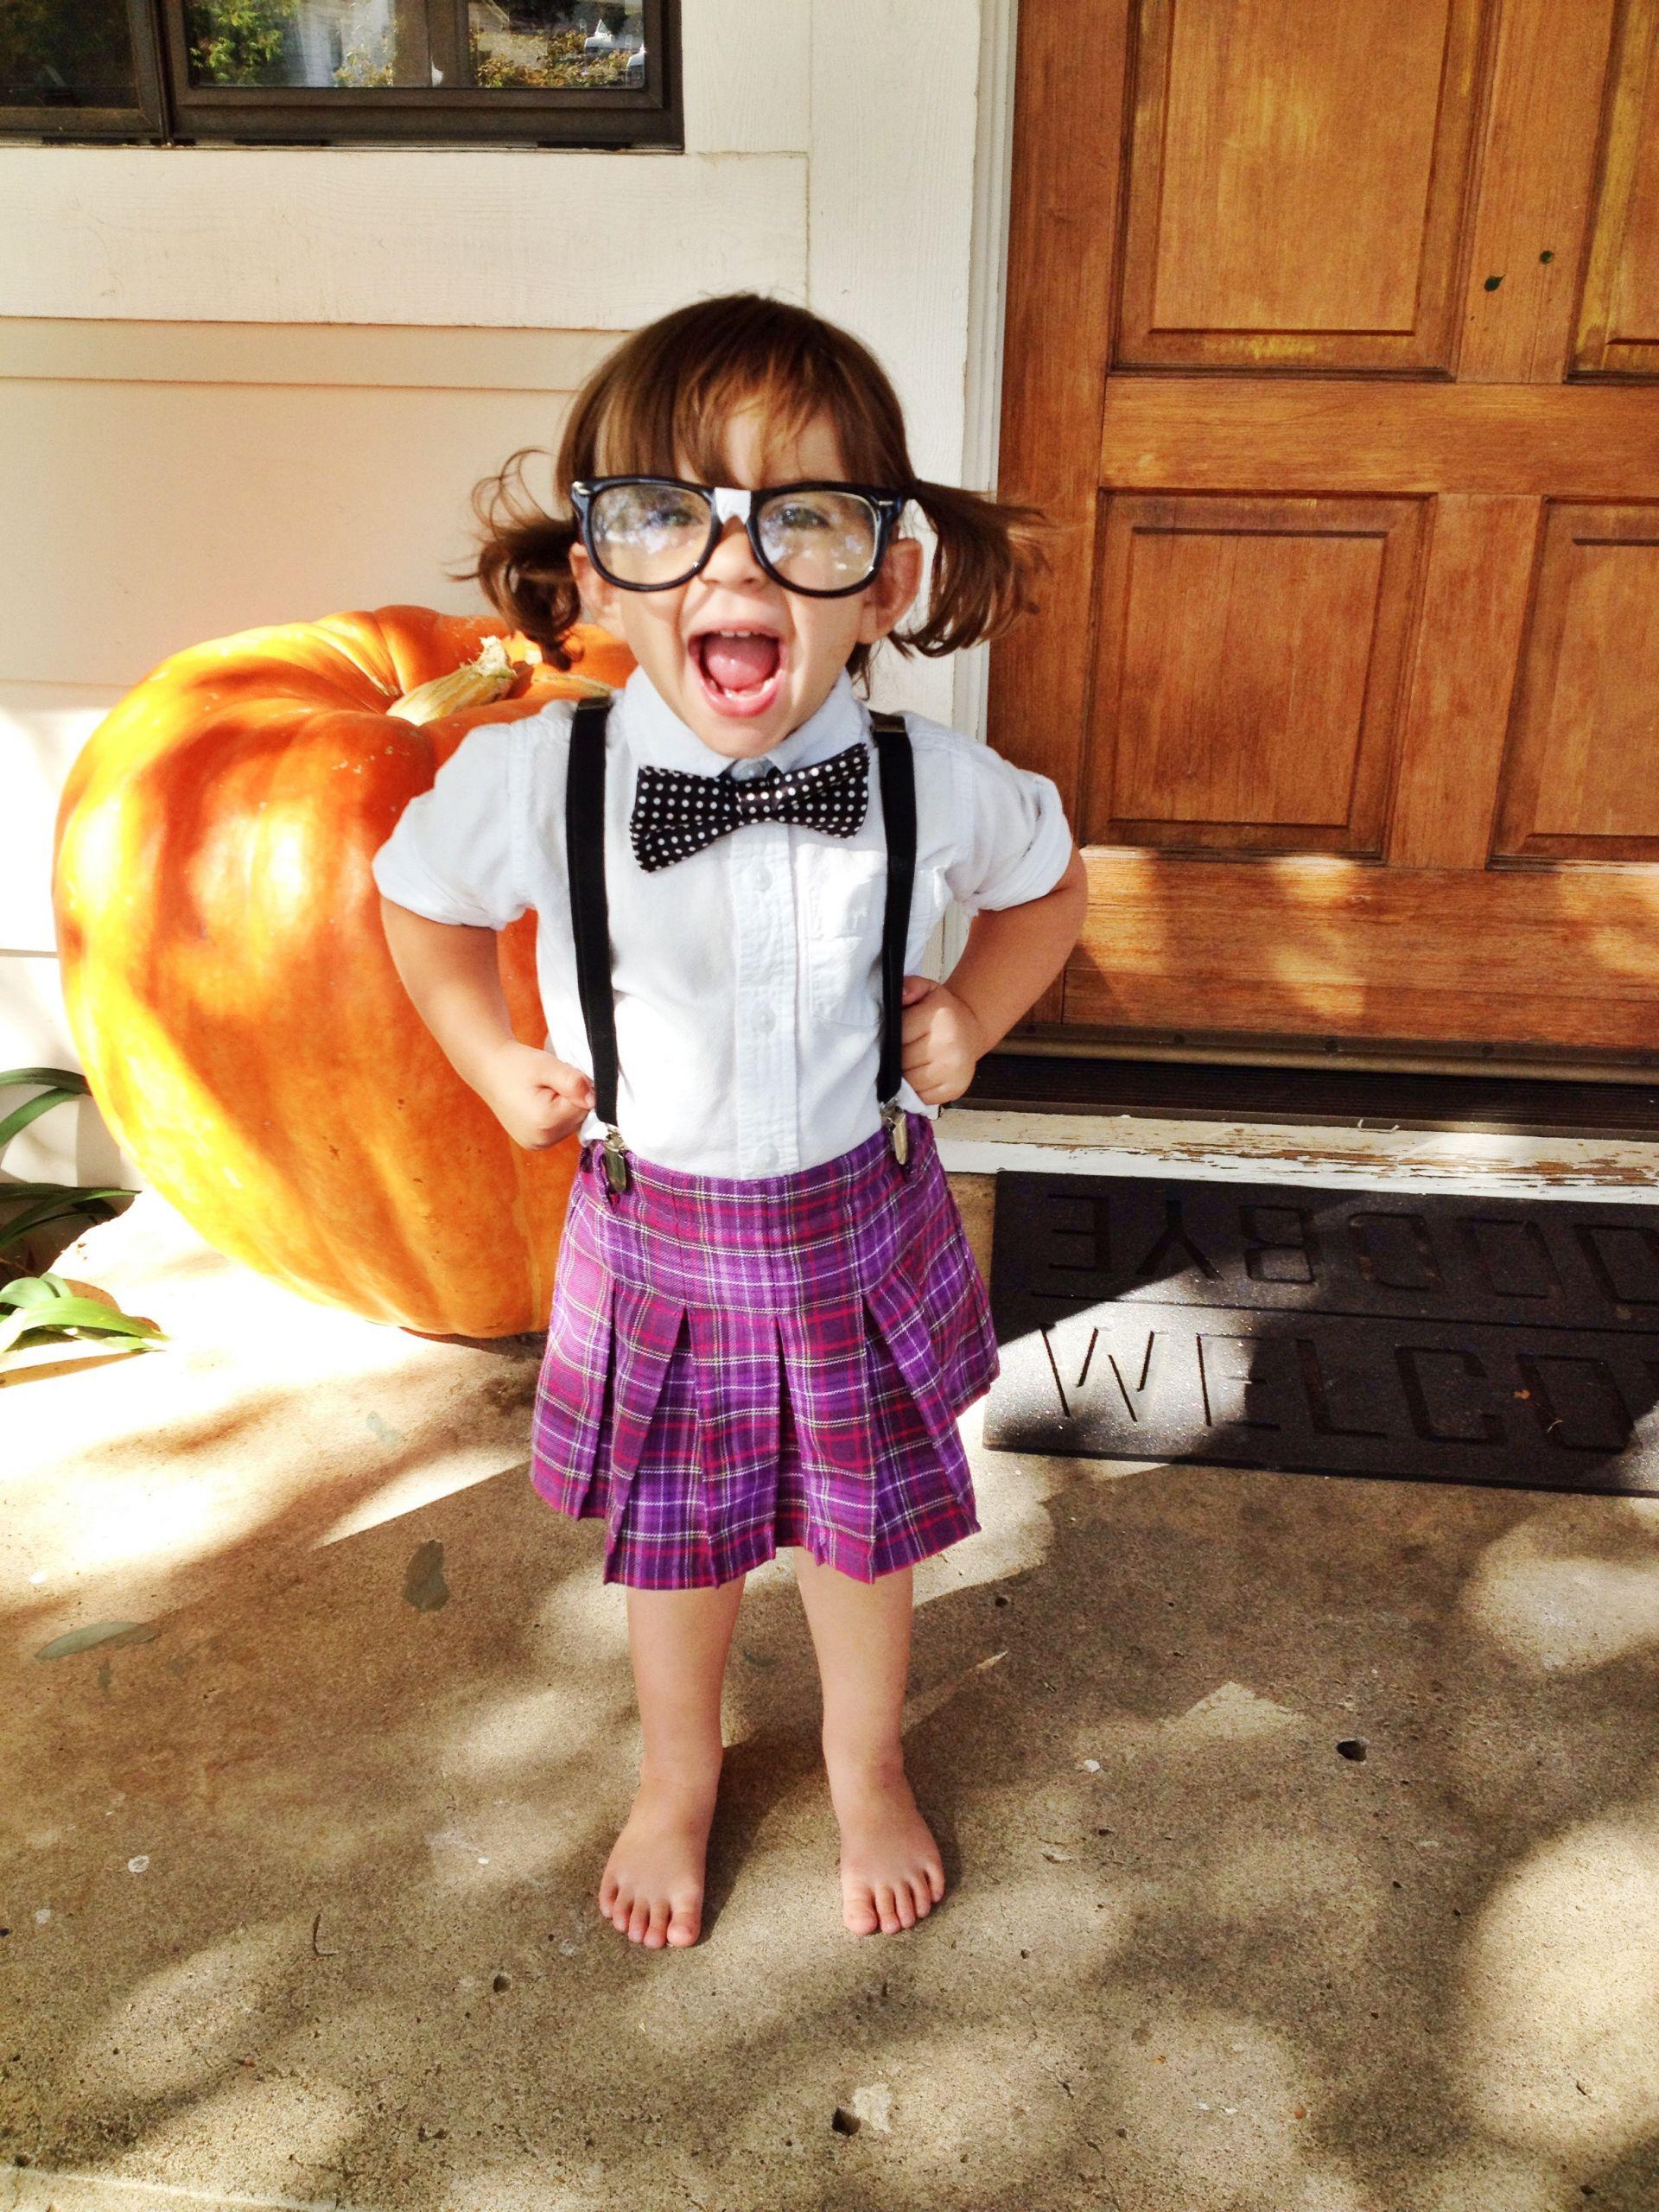 DIY Halloween Costumes  Easy Inexpensive & Adorable DIY Halloween Costumes for